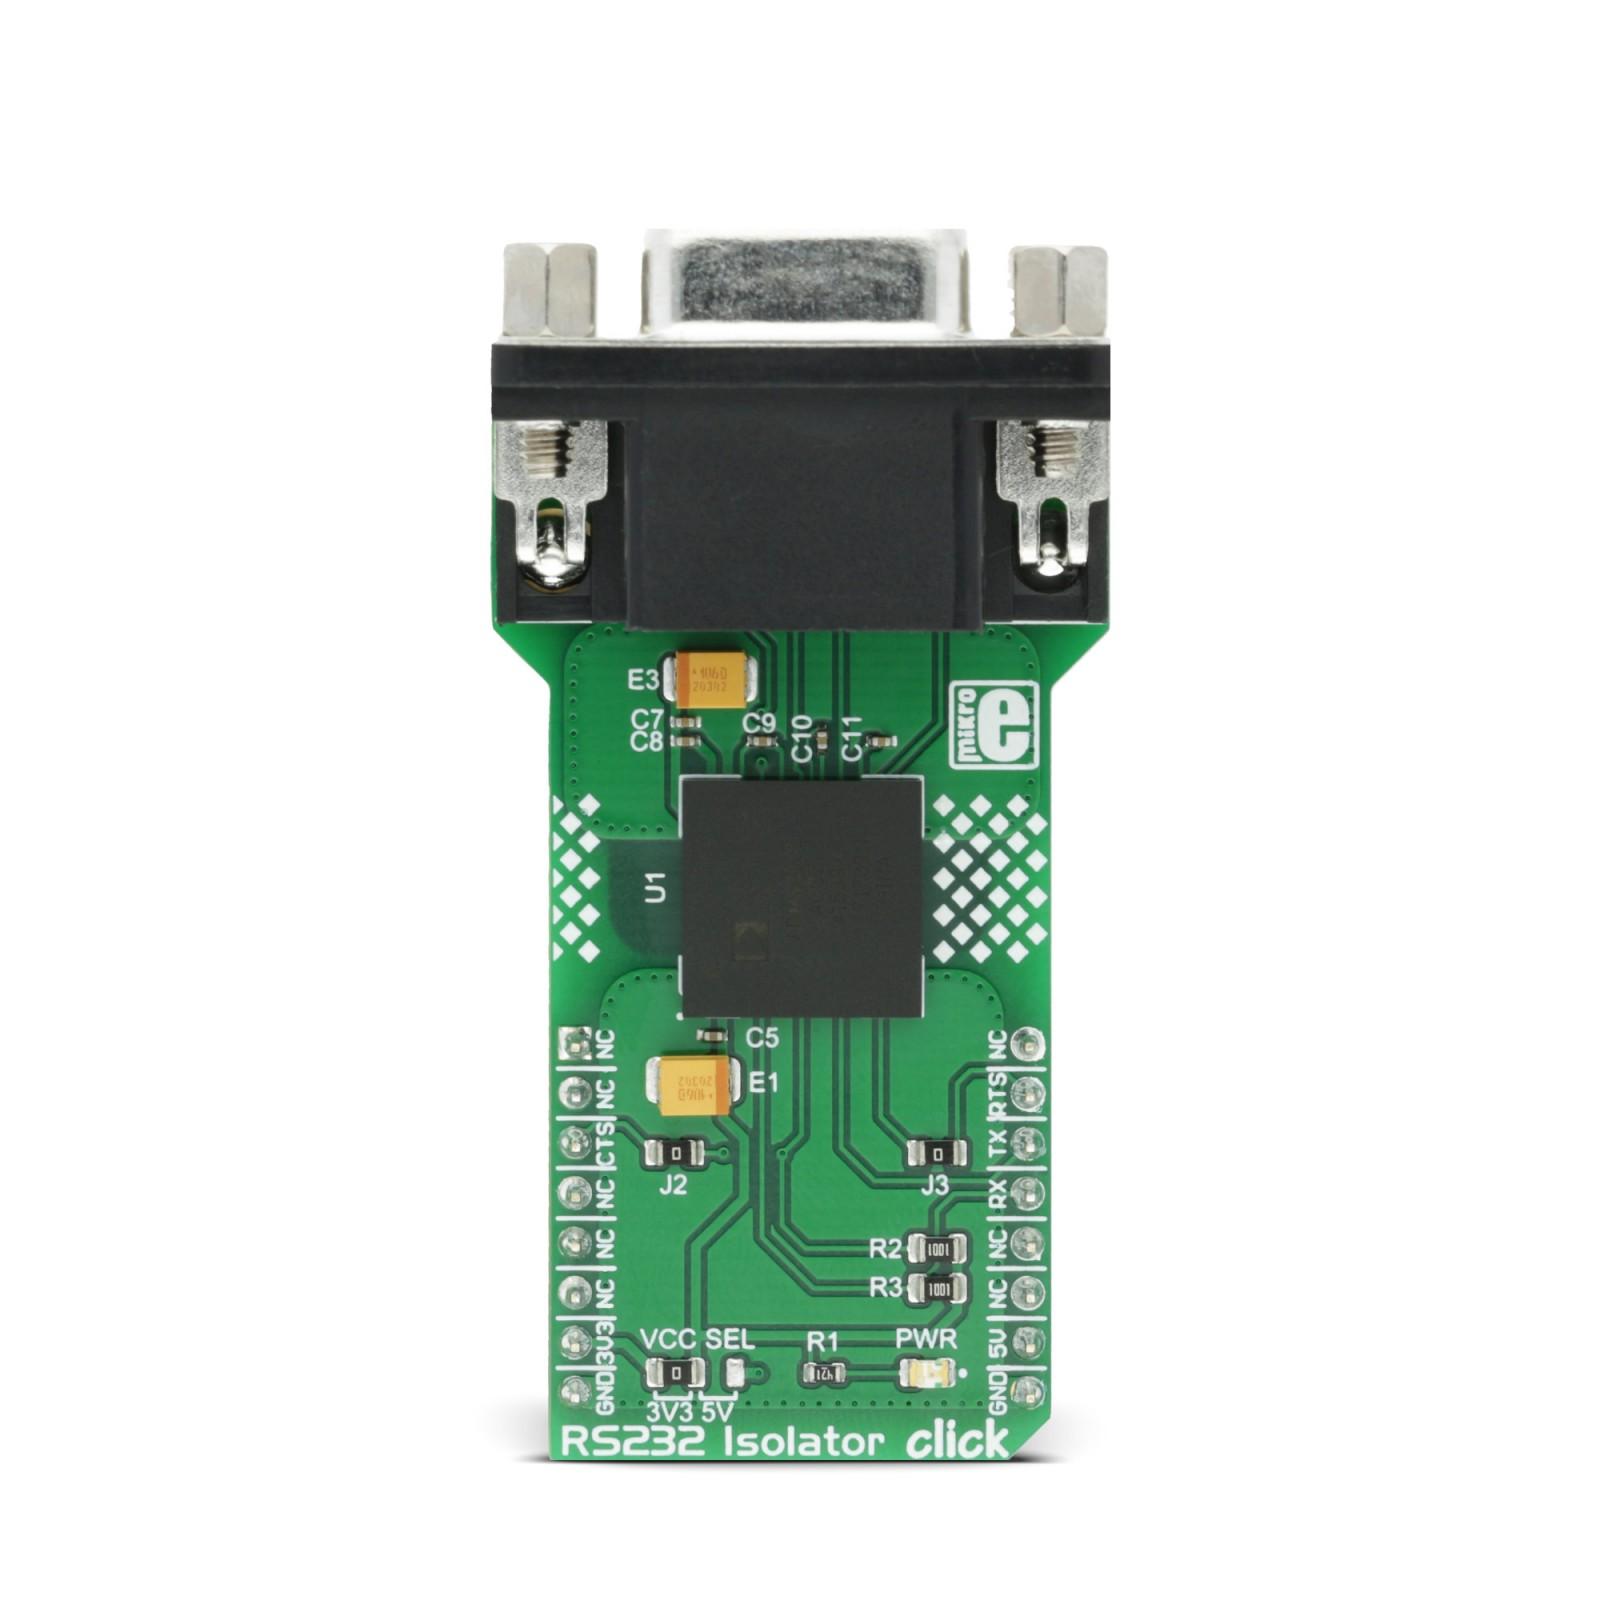 RS232 Isolator click   MikroElektronika